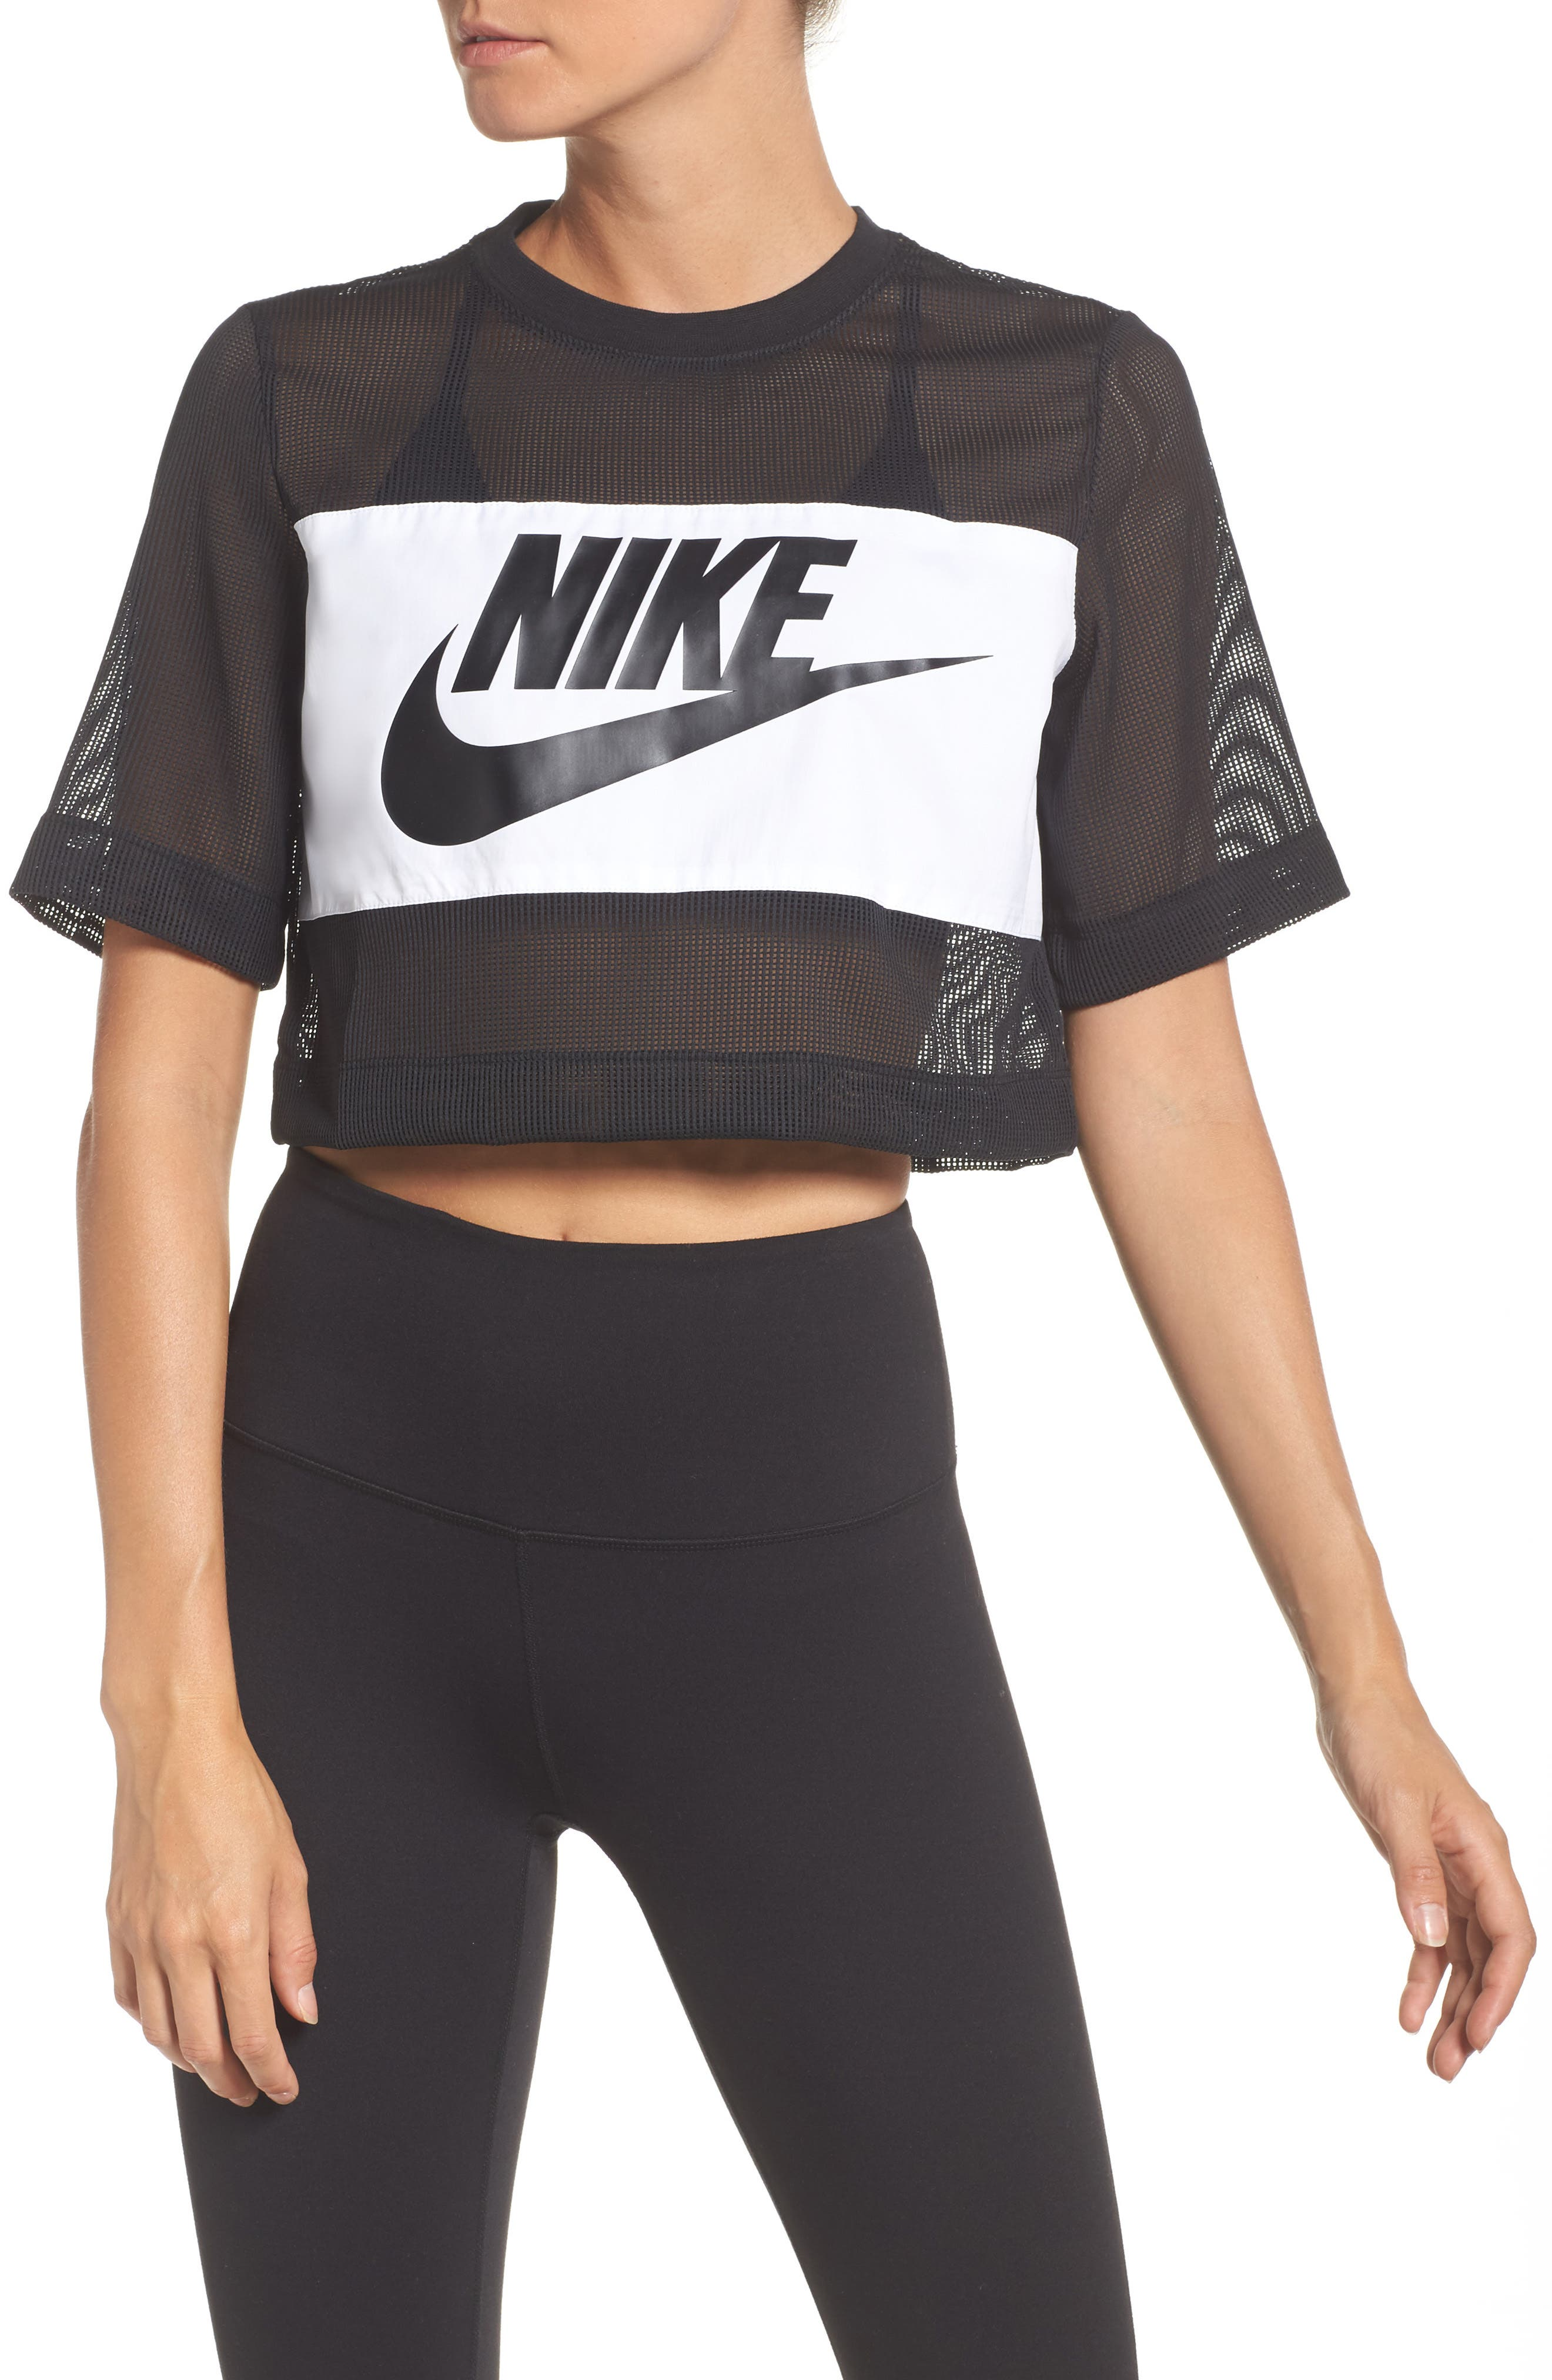 NIKE Sportswear Mesh Crop Top